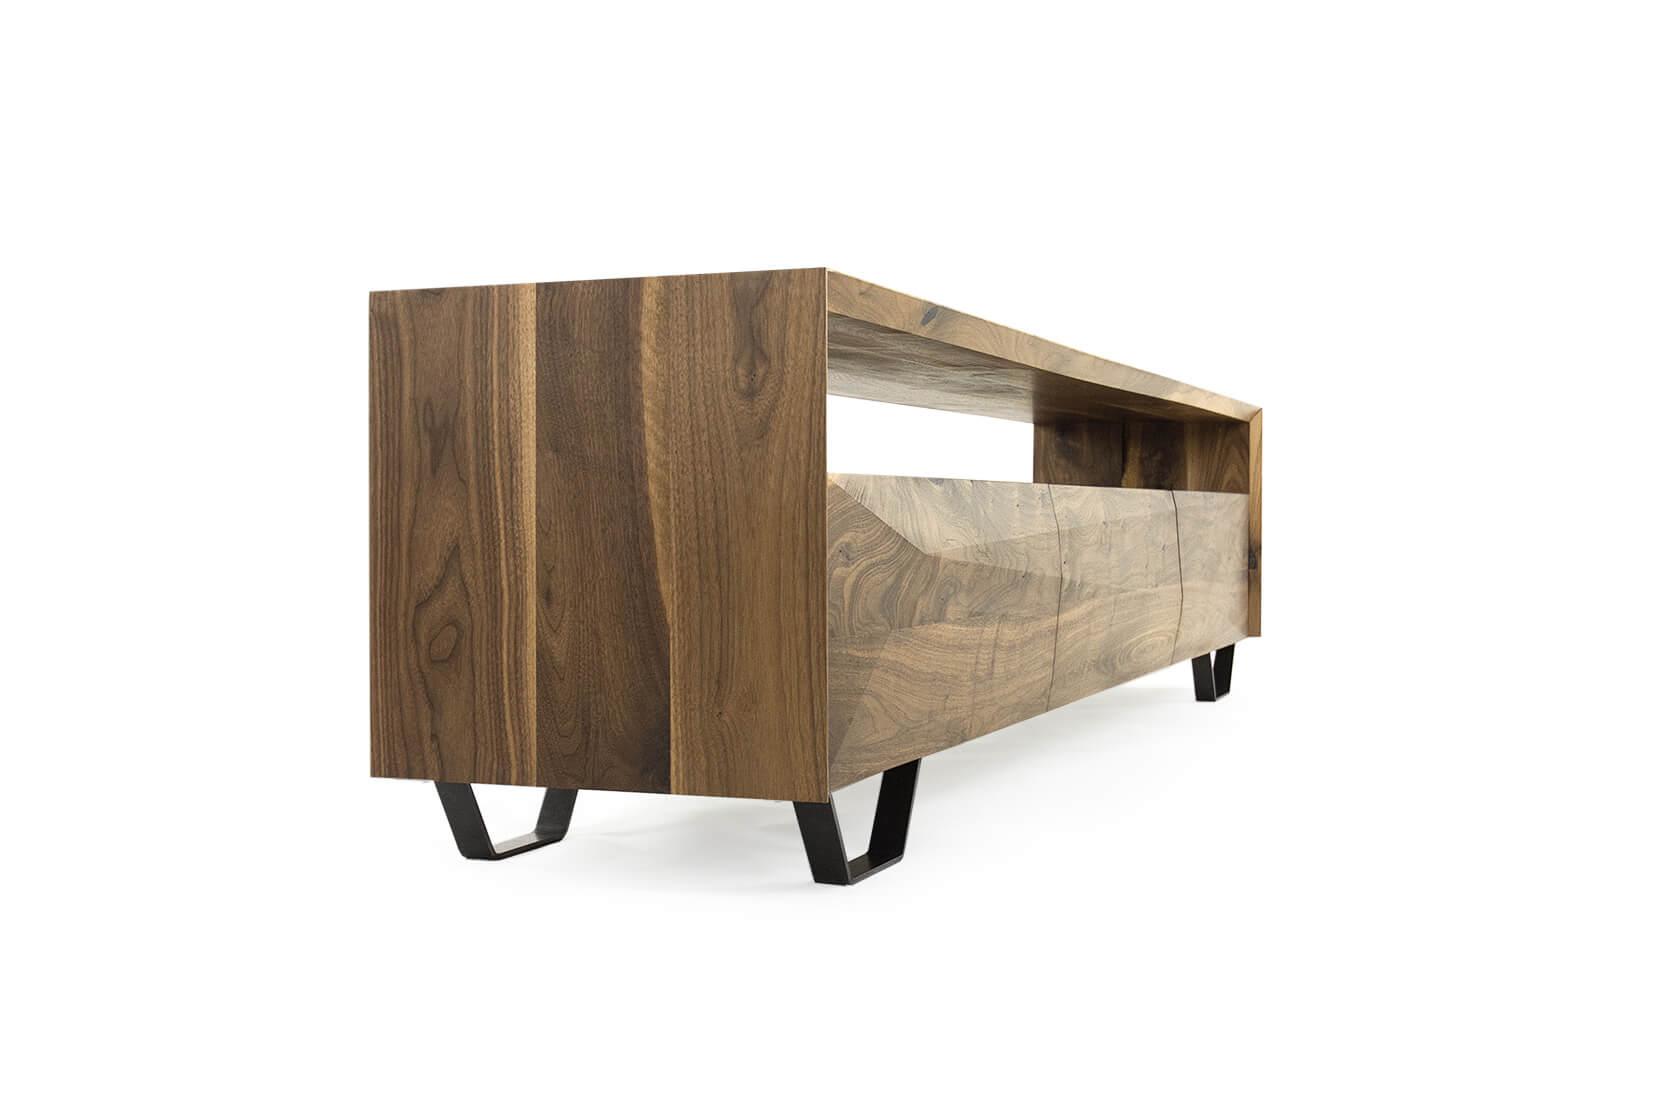 raw_creative_furniture__DSC3261.jpg